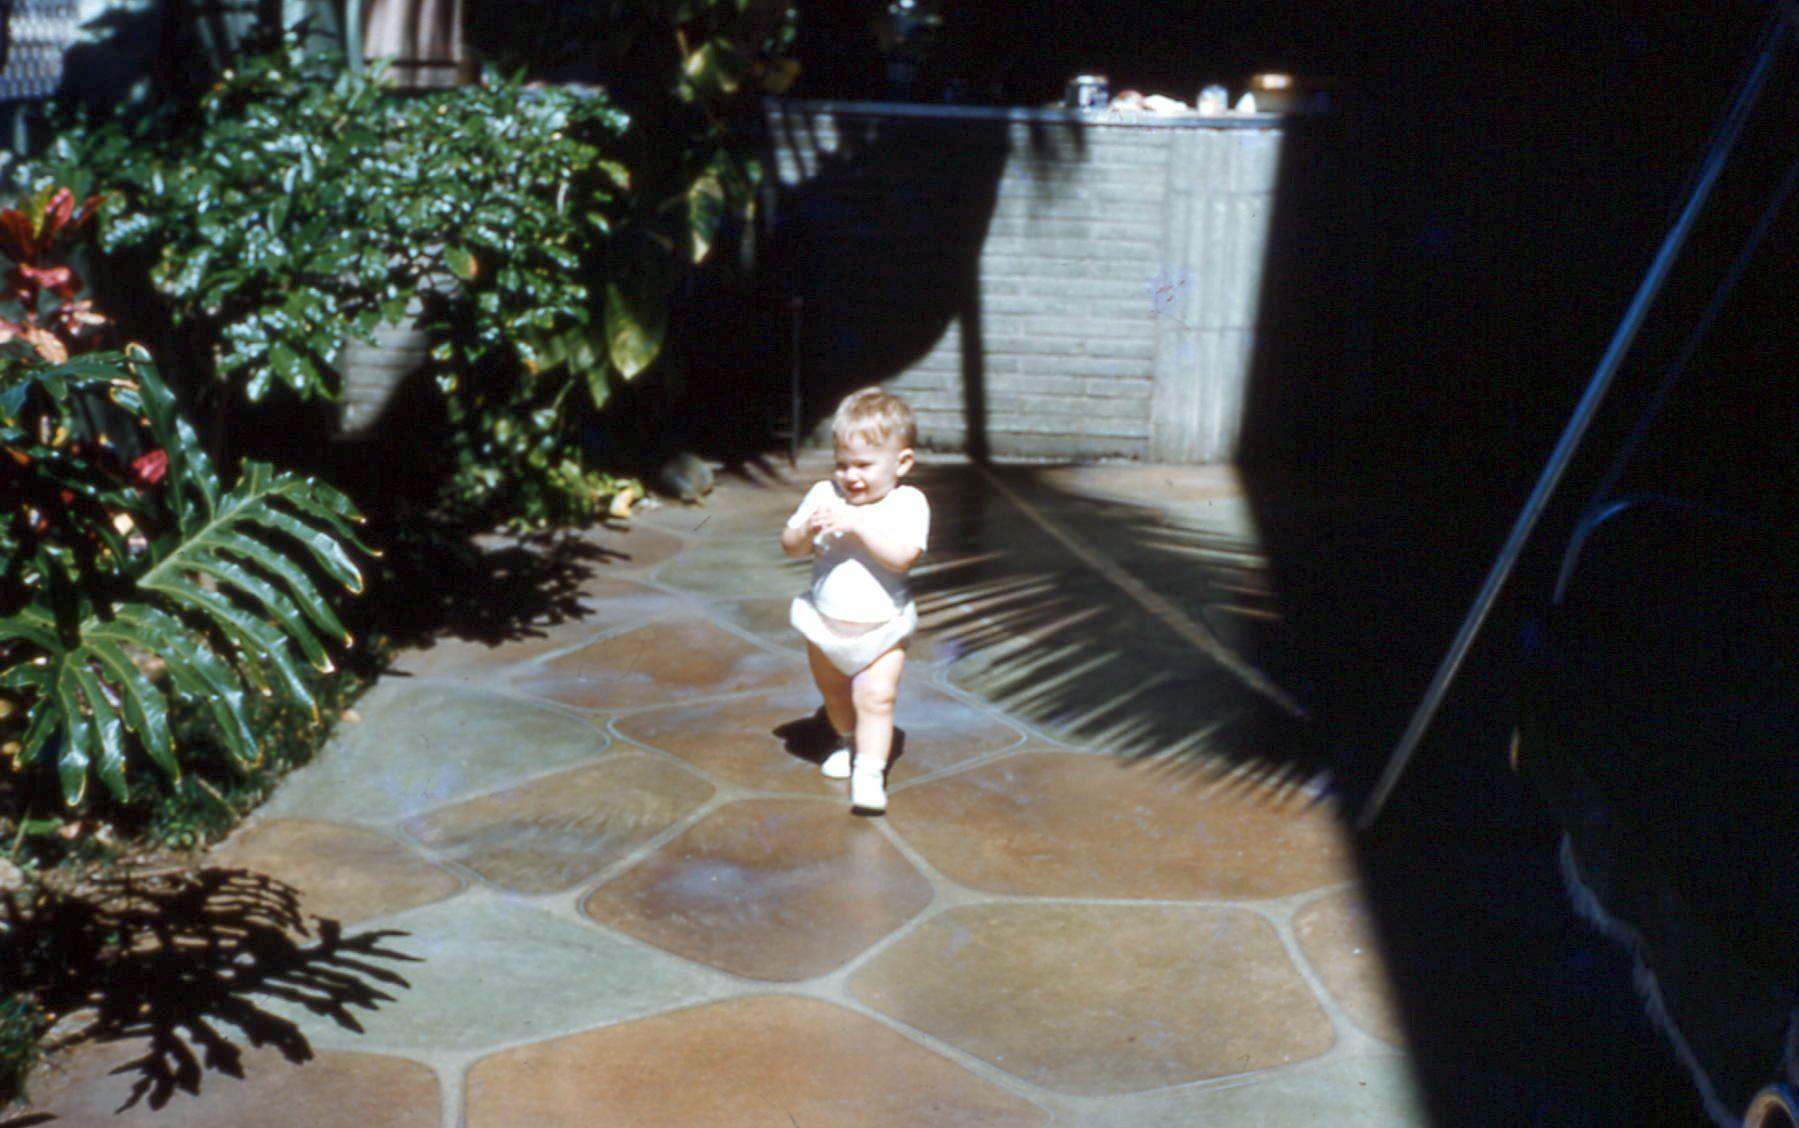 Backyard Floor Tiles : FileStone tile patio, Hawaii, 1960JPG  Wikipedia